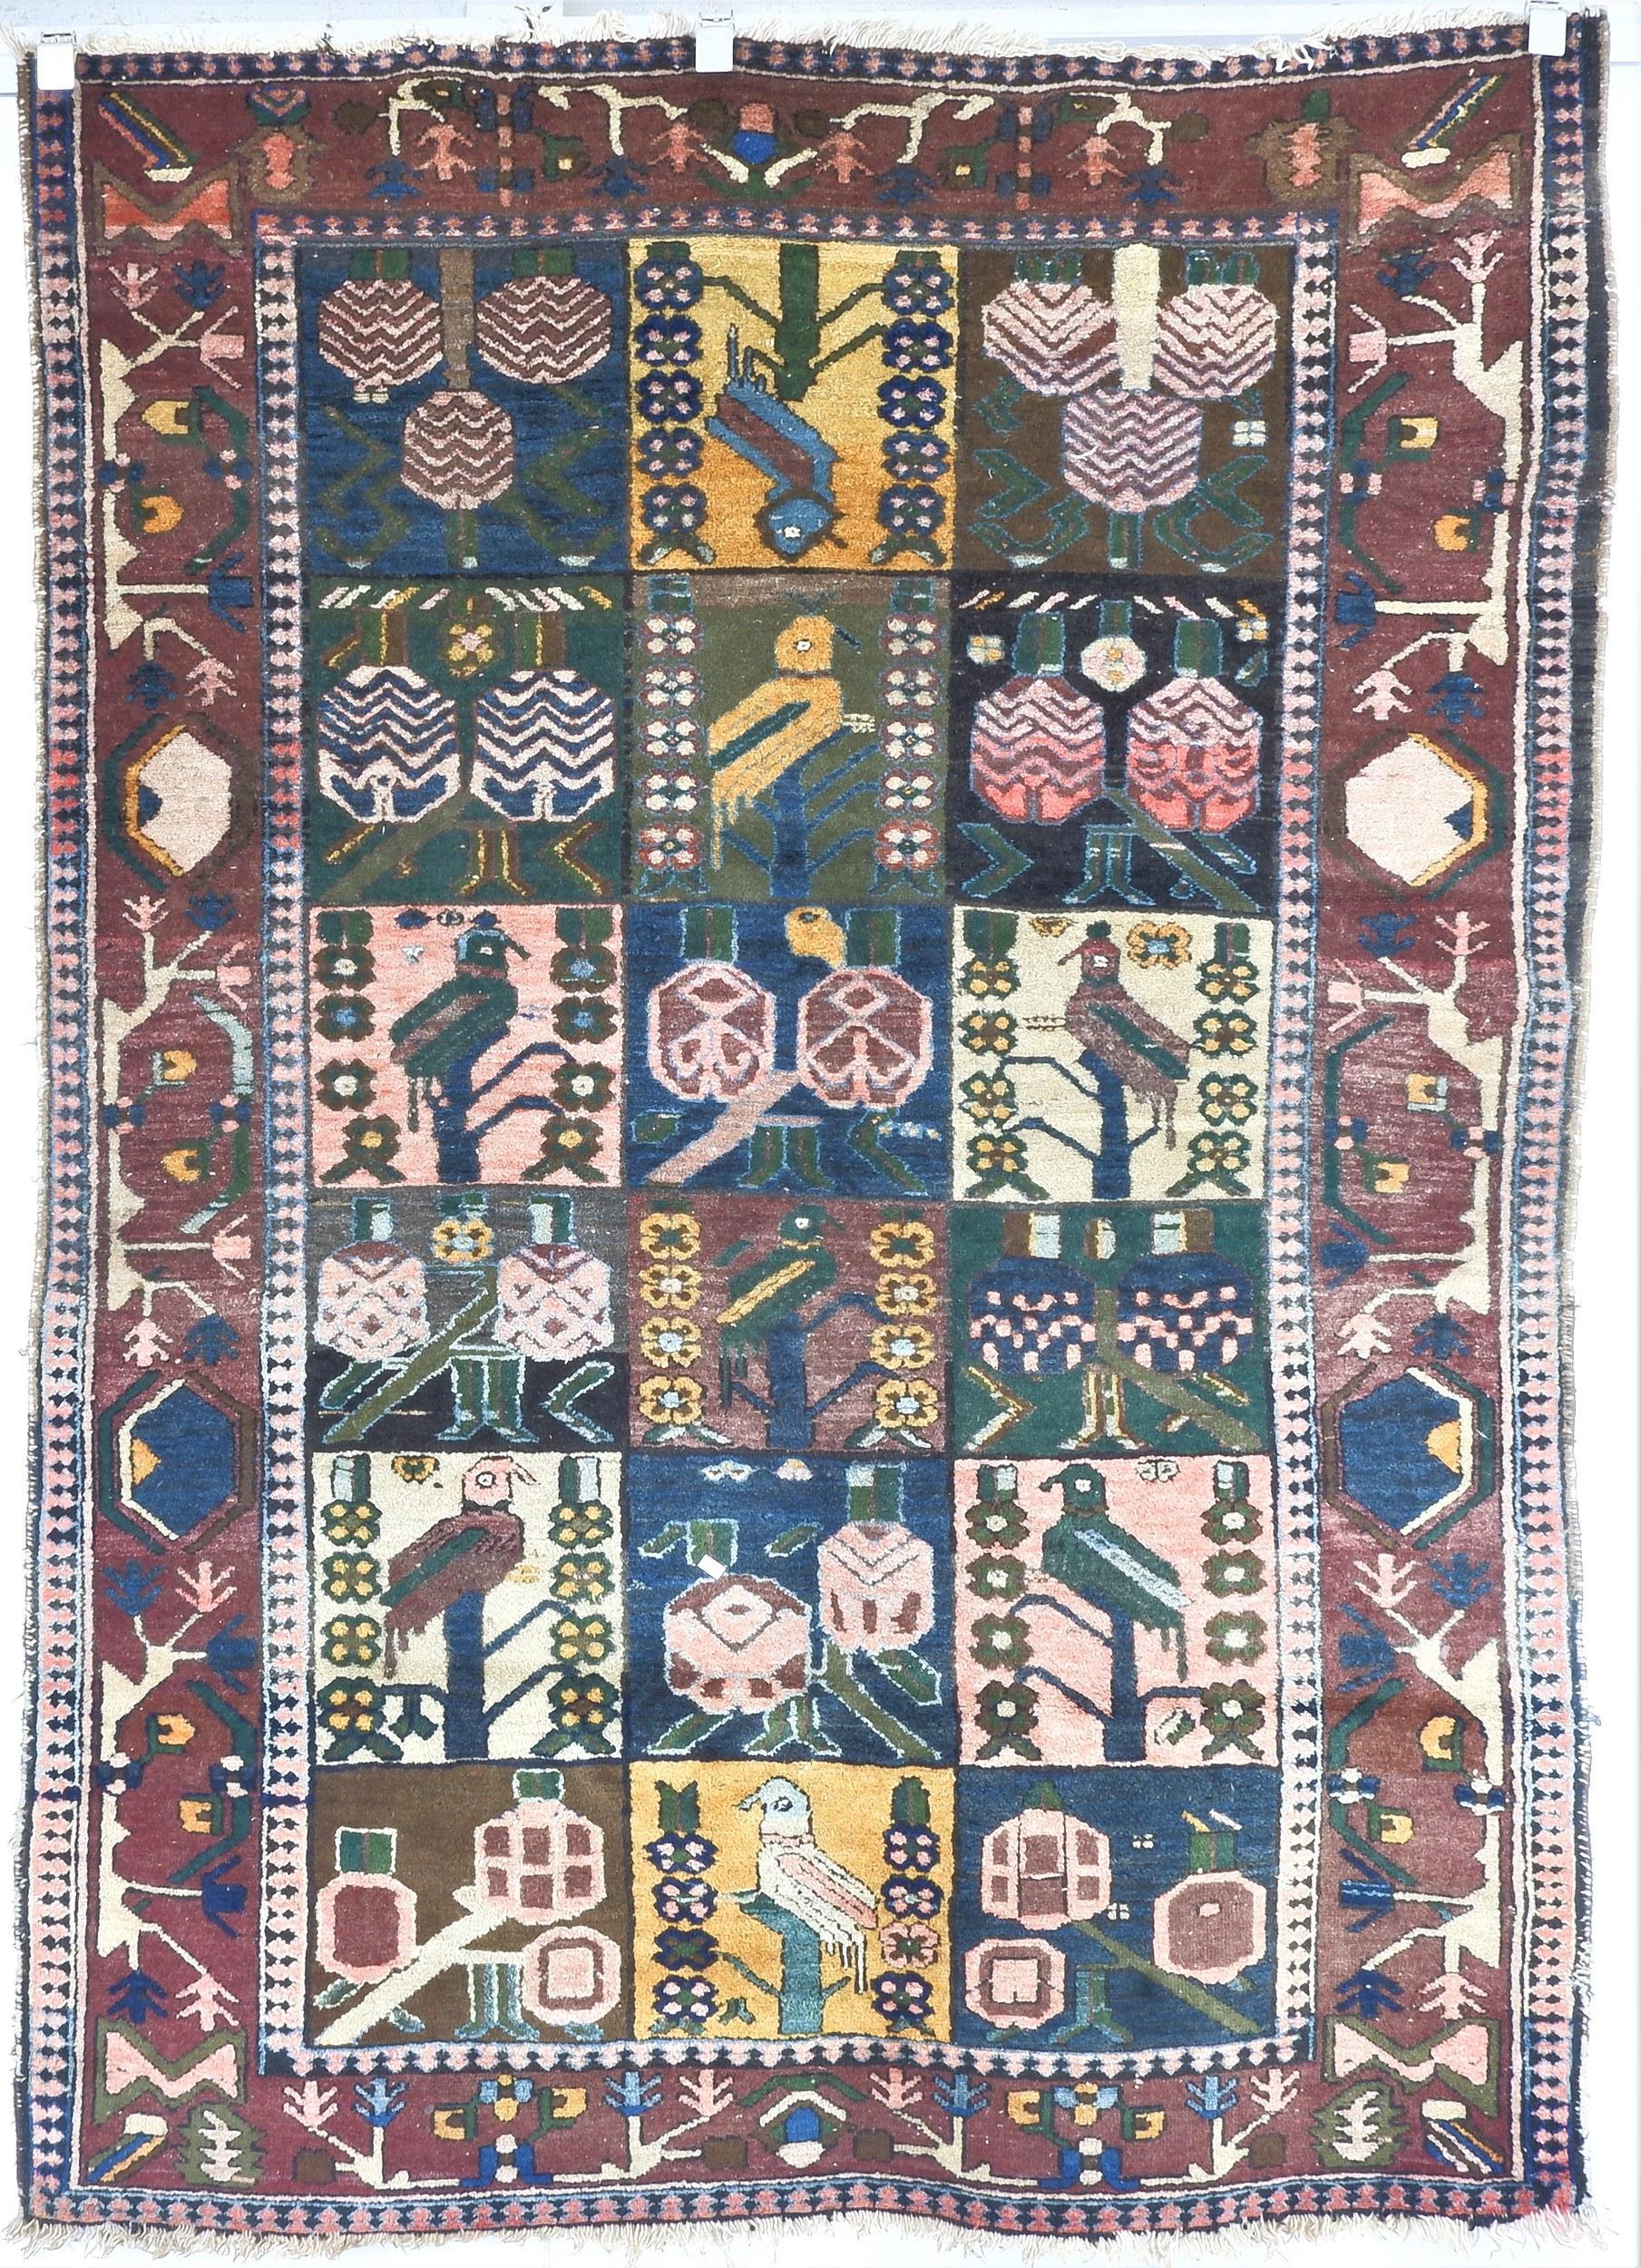 'Antique Persian Bakhtiari Hand Woven Wool Pile Rug'